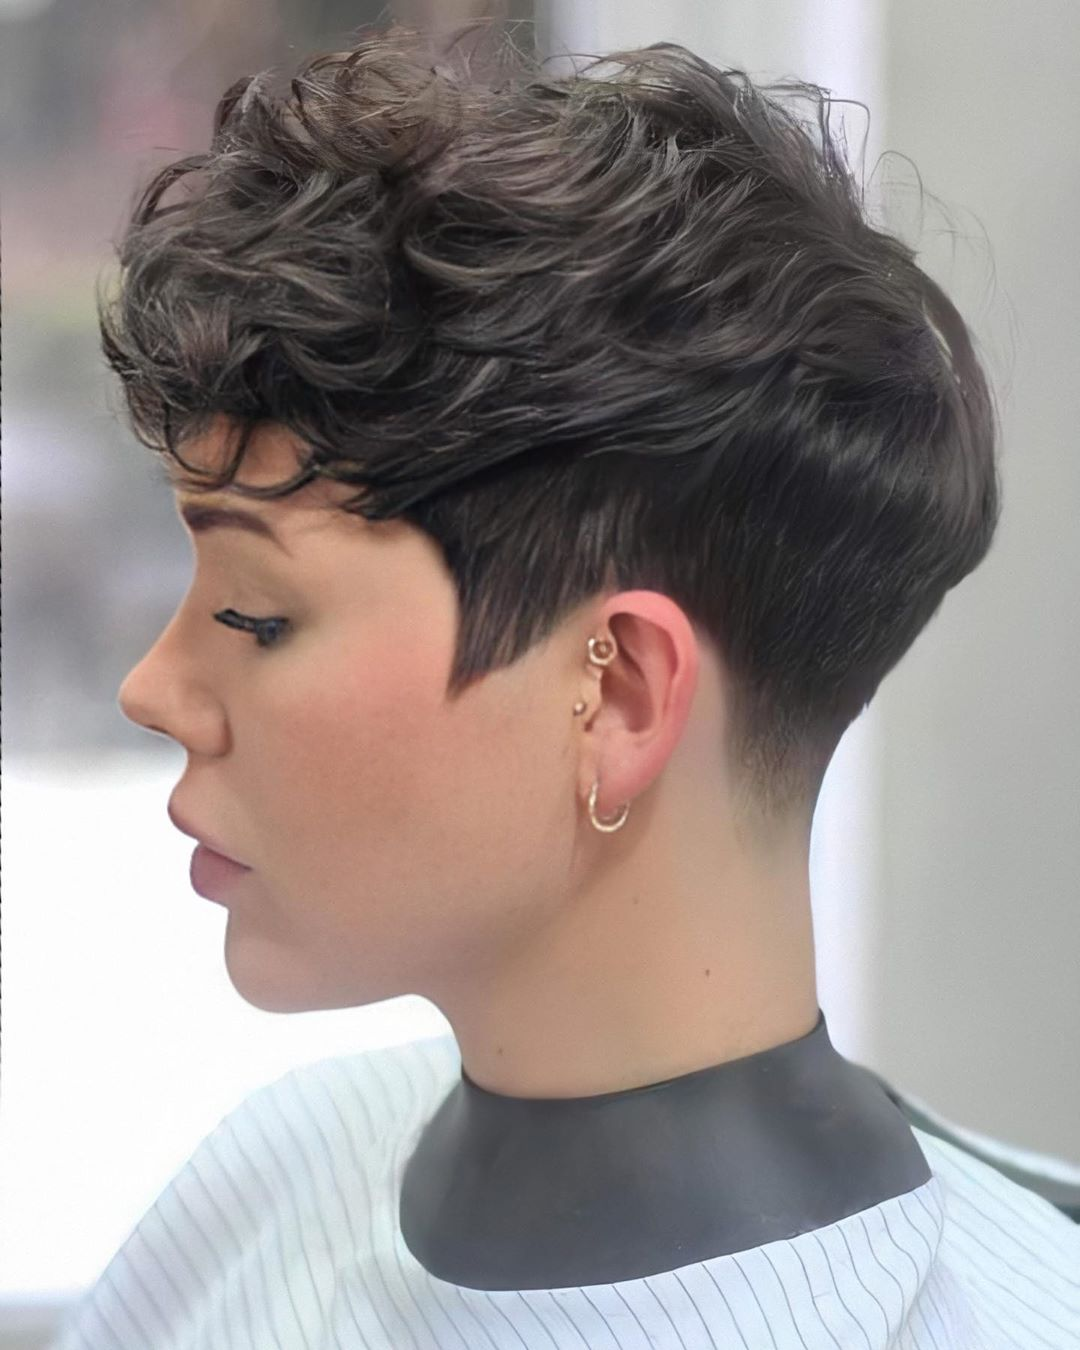 Stylish Short Pixie Cut and Color 2021 - Women Short ...